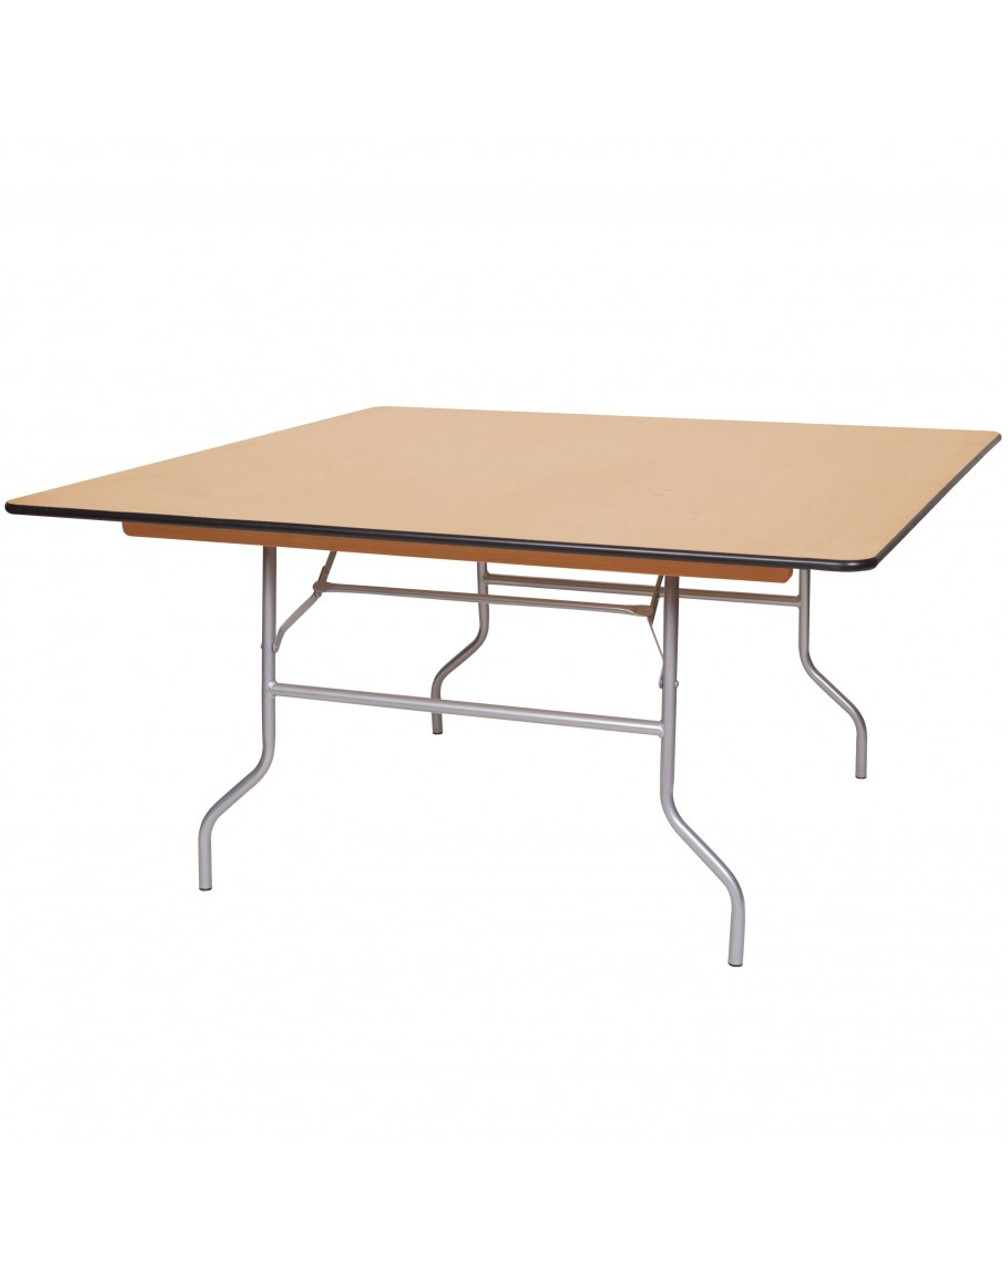 Premier series 48w x 48l 4ft square plywood banquet folding premier series 48w x 48l 4ft square plywood banquet folding watchthetrailerfo